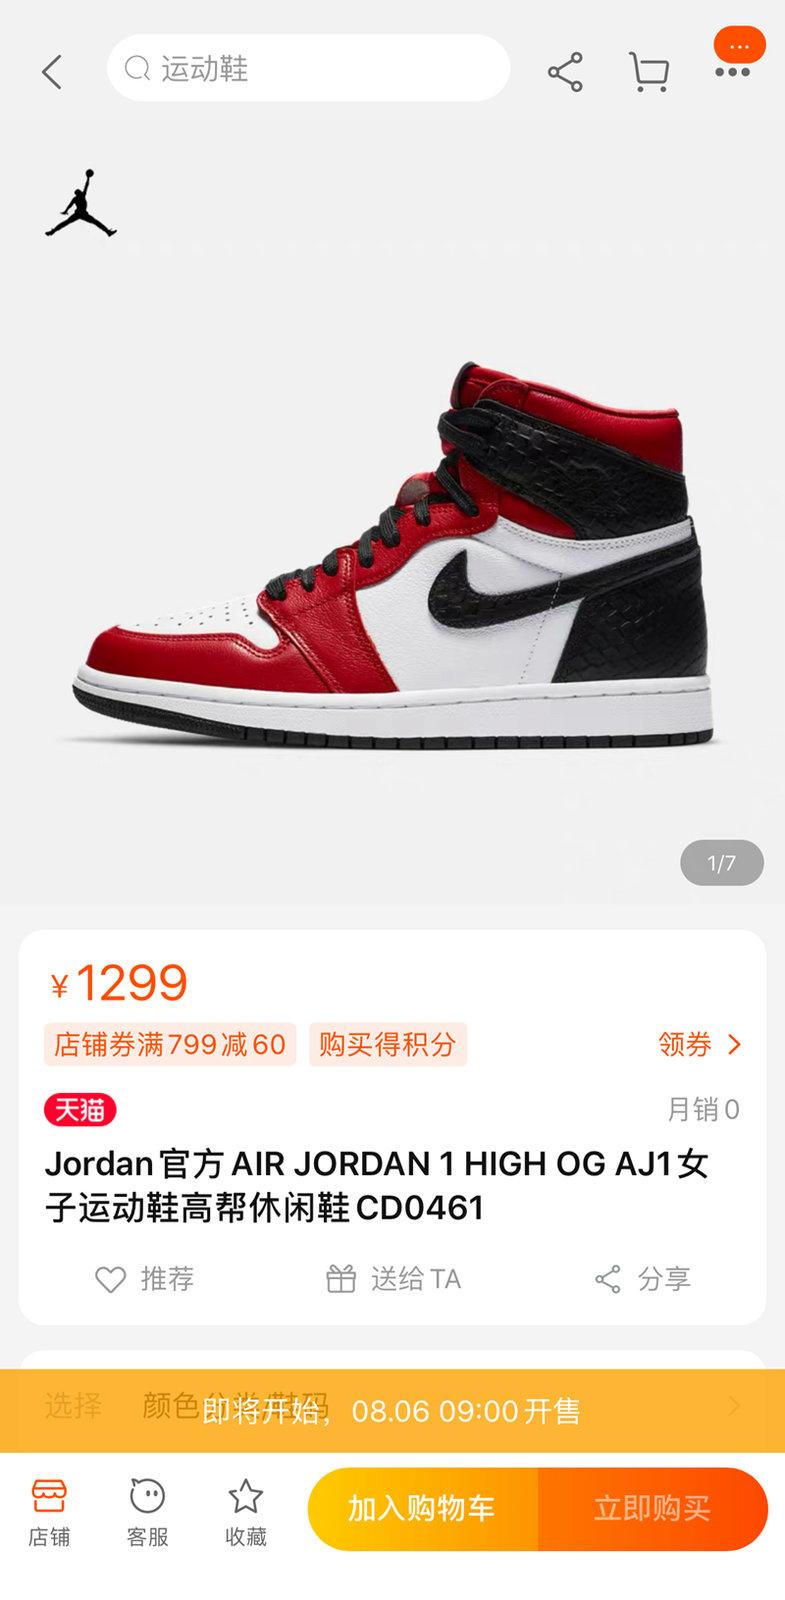 Air Jordan 1,AJ,AJ1,WMNS,Satin  天猫预告释出!「蛇纹芝加哥」Air Jordan 1 下周发售!